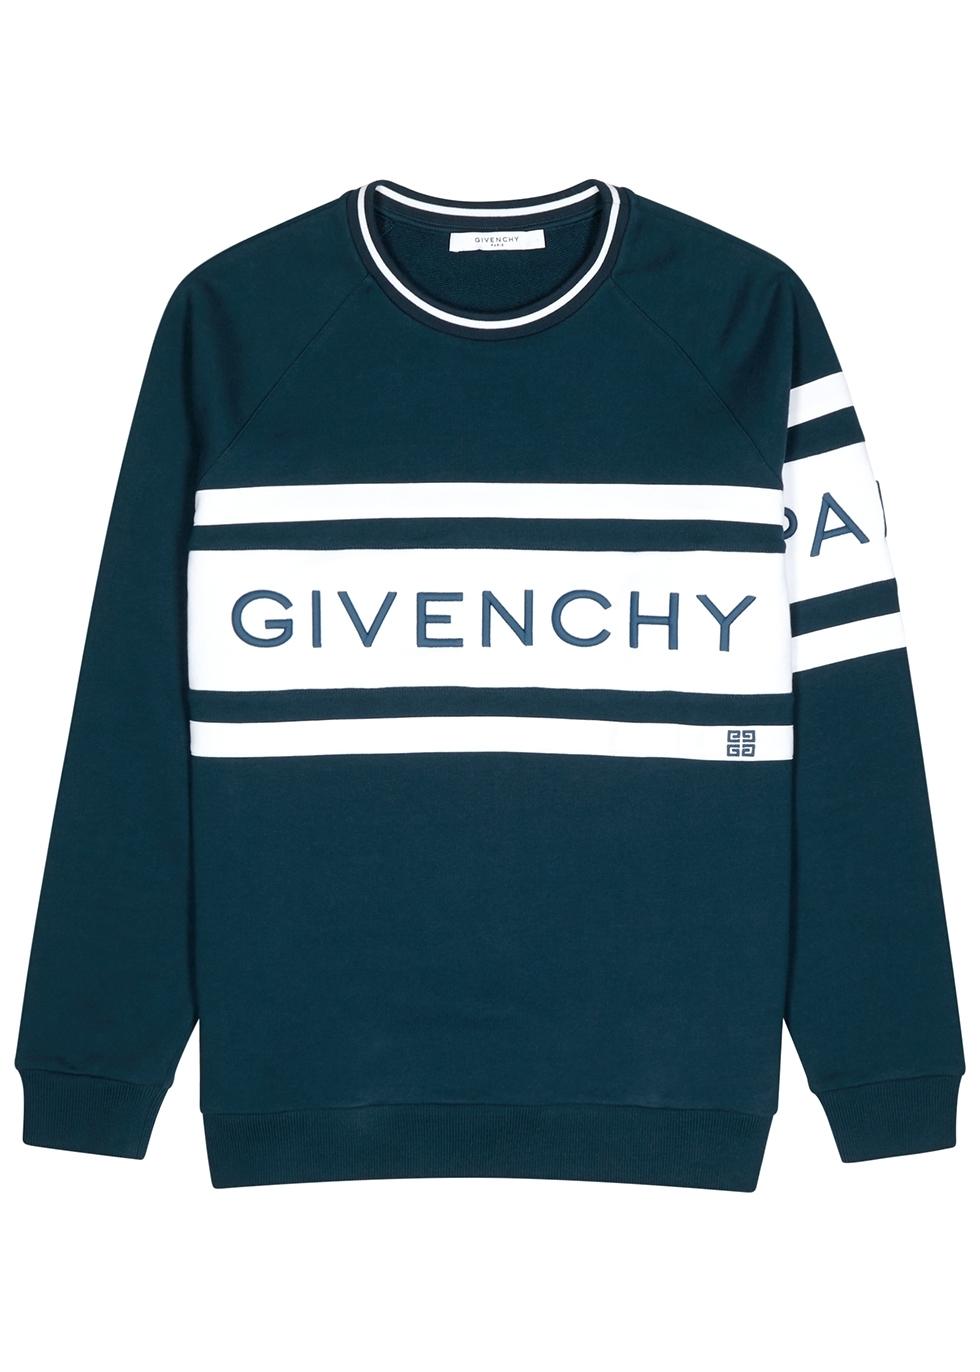 9da95c7fb0b Givenchy - Mens - Harvey Nichols